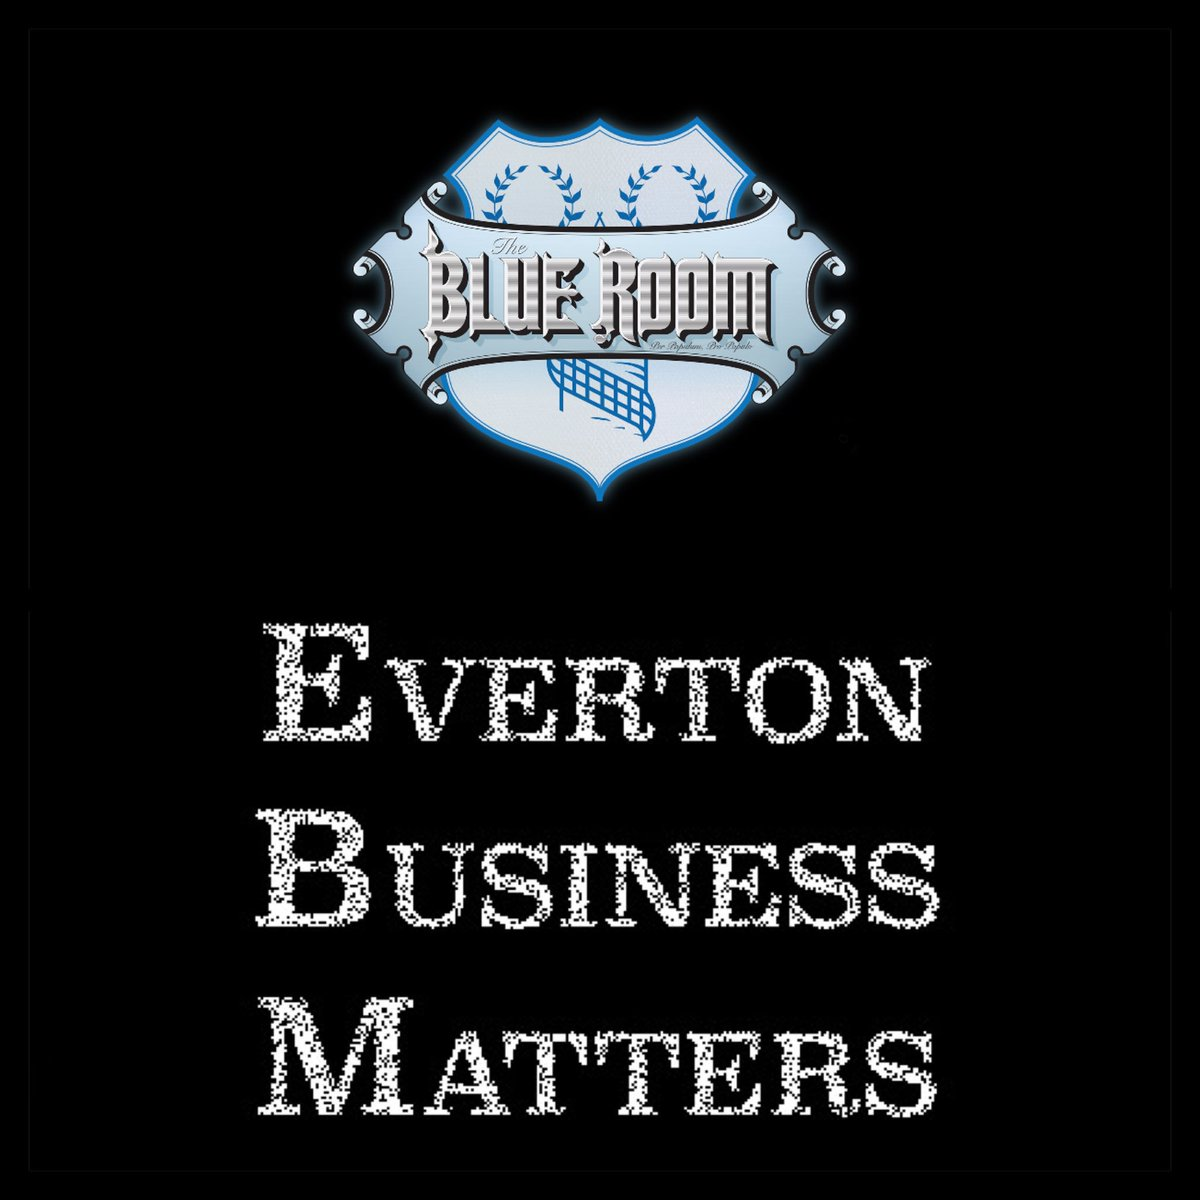 LISTEN: #EvertonBusinessMatters Episode 4 is now available! #EFC  http://www. theblueroomefc.com/2017/06/podcas t-everton-business-matters-episode-4/ &nbsp; … <br>http://pic.twitter.com/zGICIWv4e8